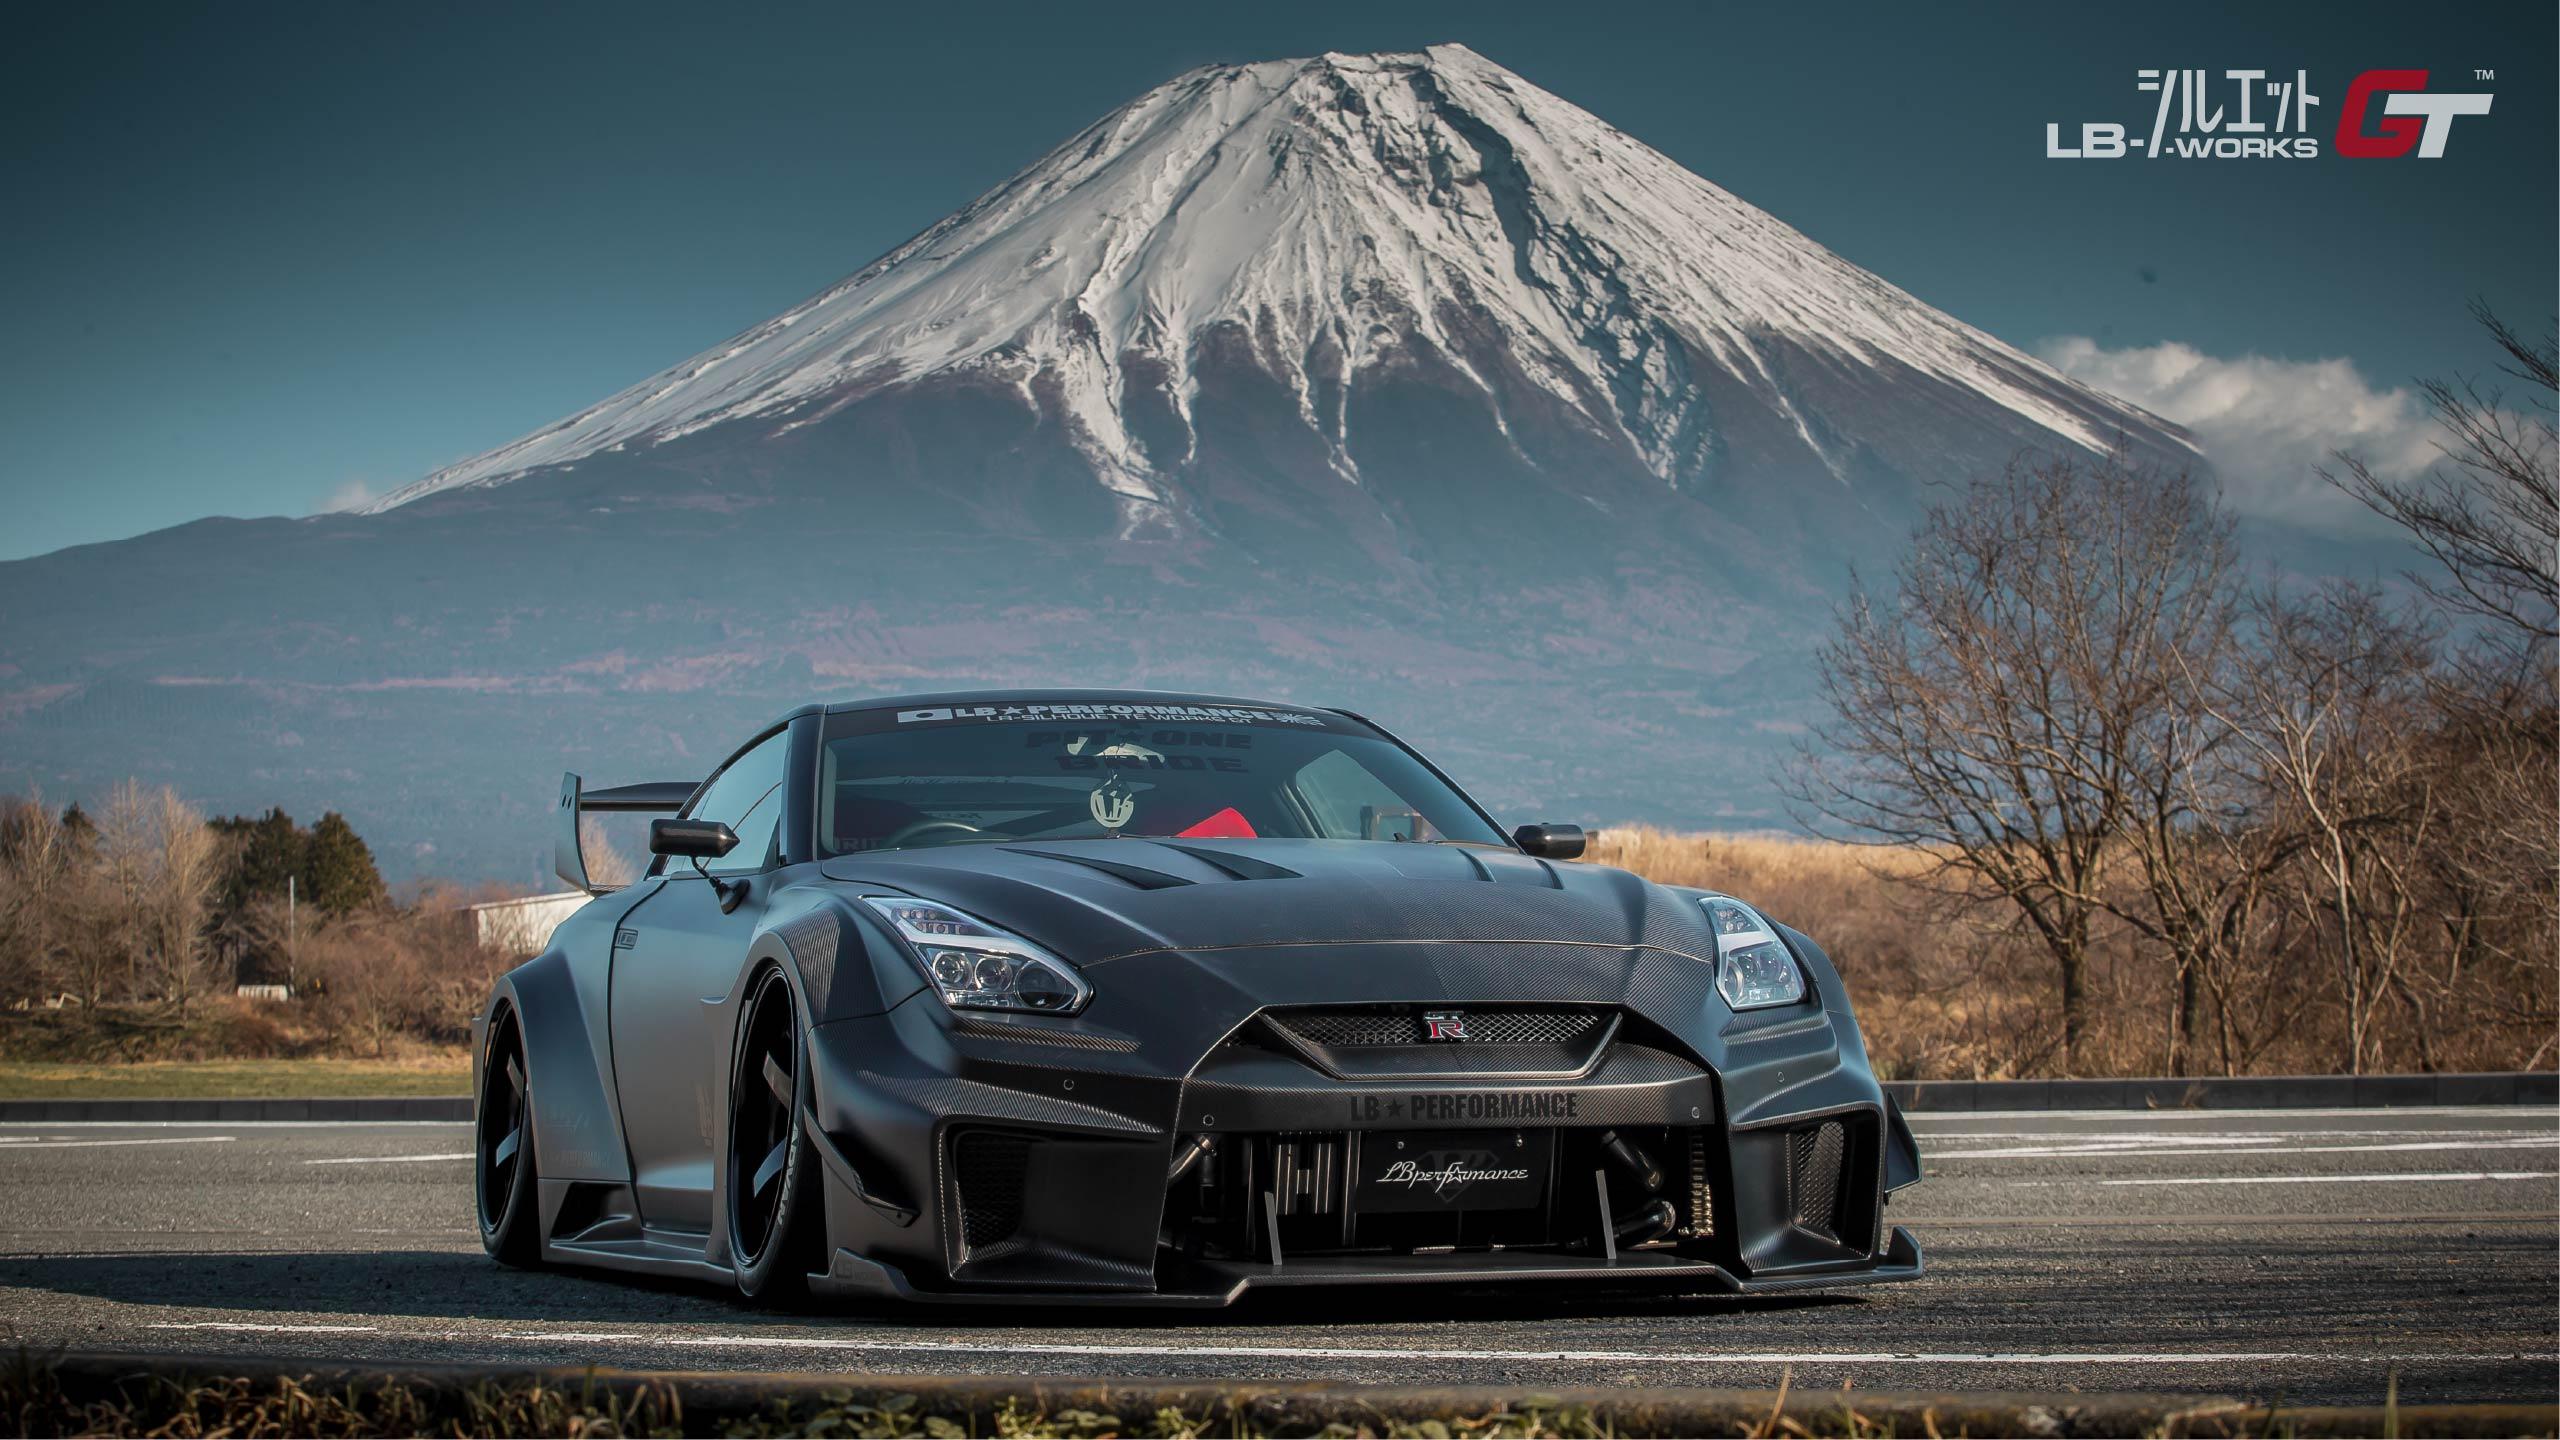 Liberty-Walk-Nissan-GT-R-Super-Silhouette-1